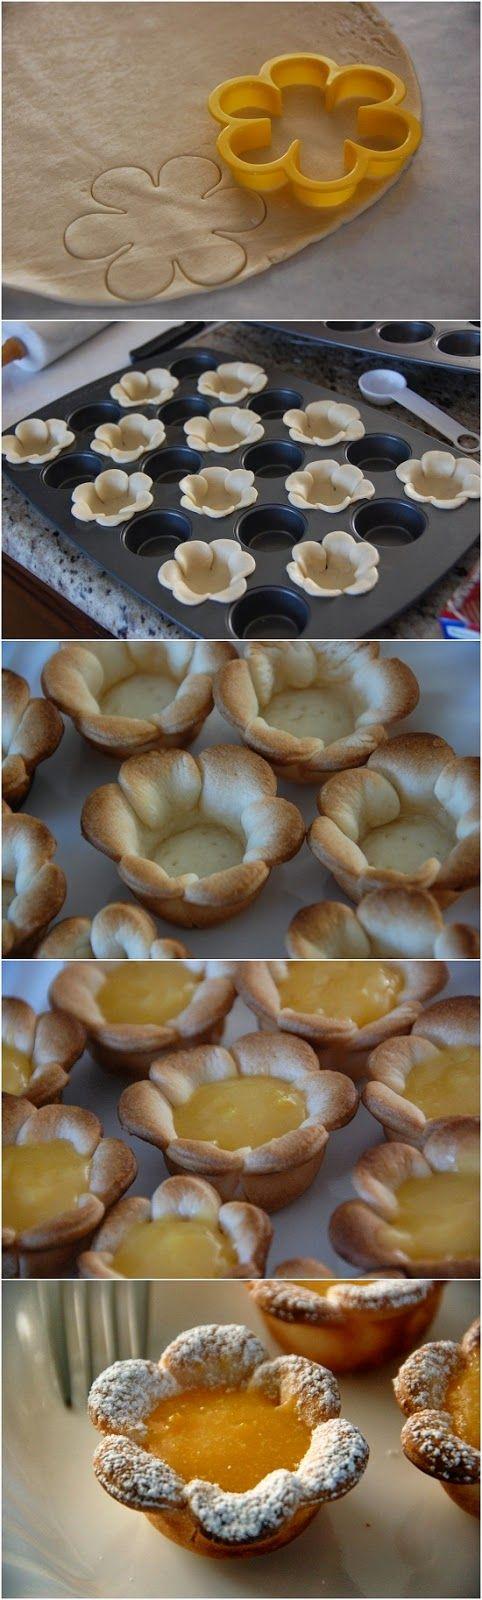 Ingredients   Mini Lemon Tarts:  1 unbaked pie crust  1 jar lemon curd  1 T. powdered sugar  Hardware:  mini muffin pan  flower shaped coo...